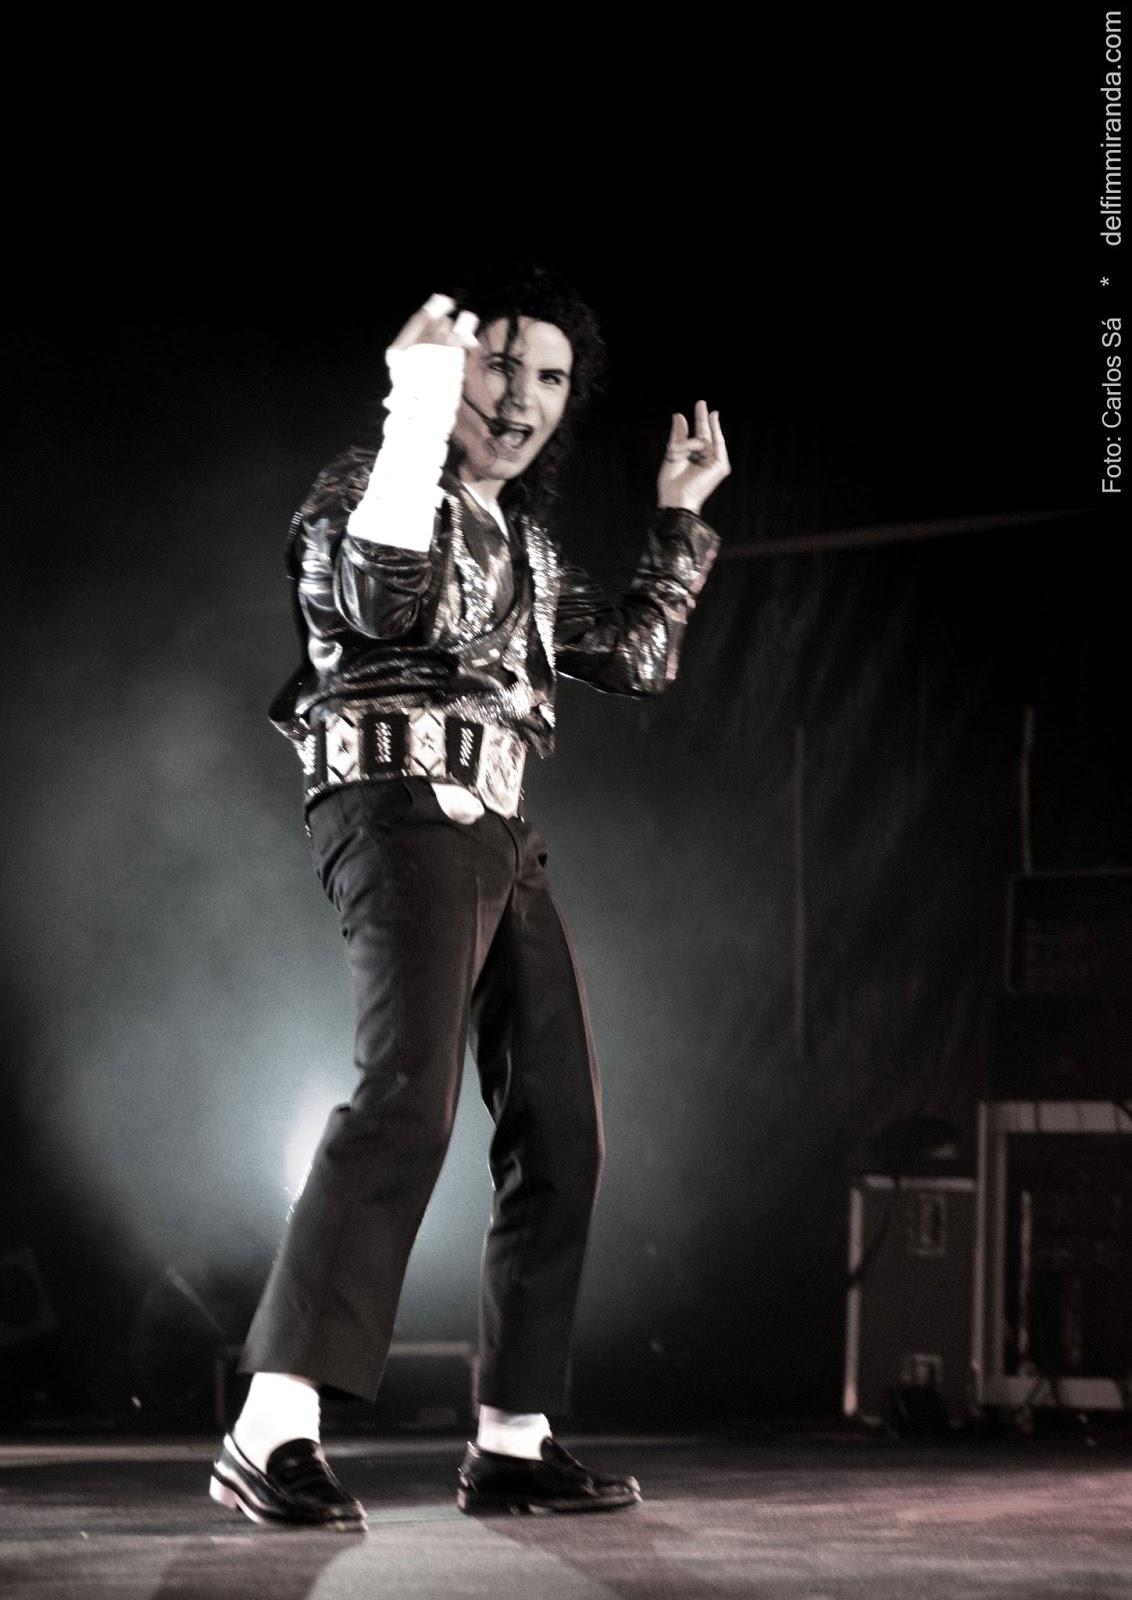 Delfim Miranda - Michael Jackson Tribute - Jam - Live Show